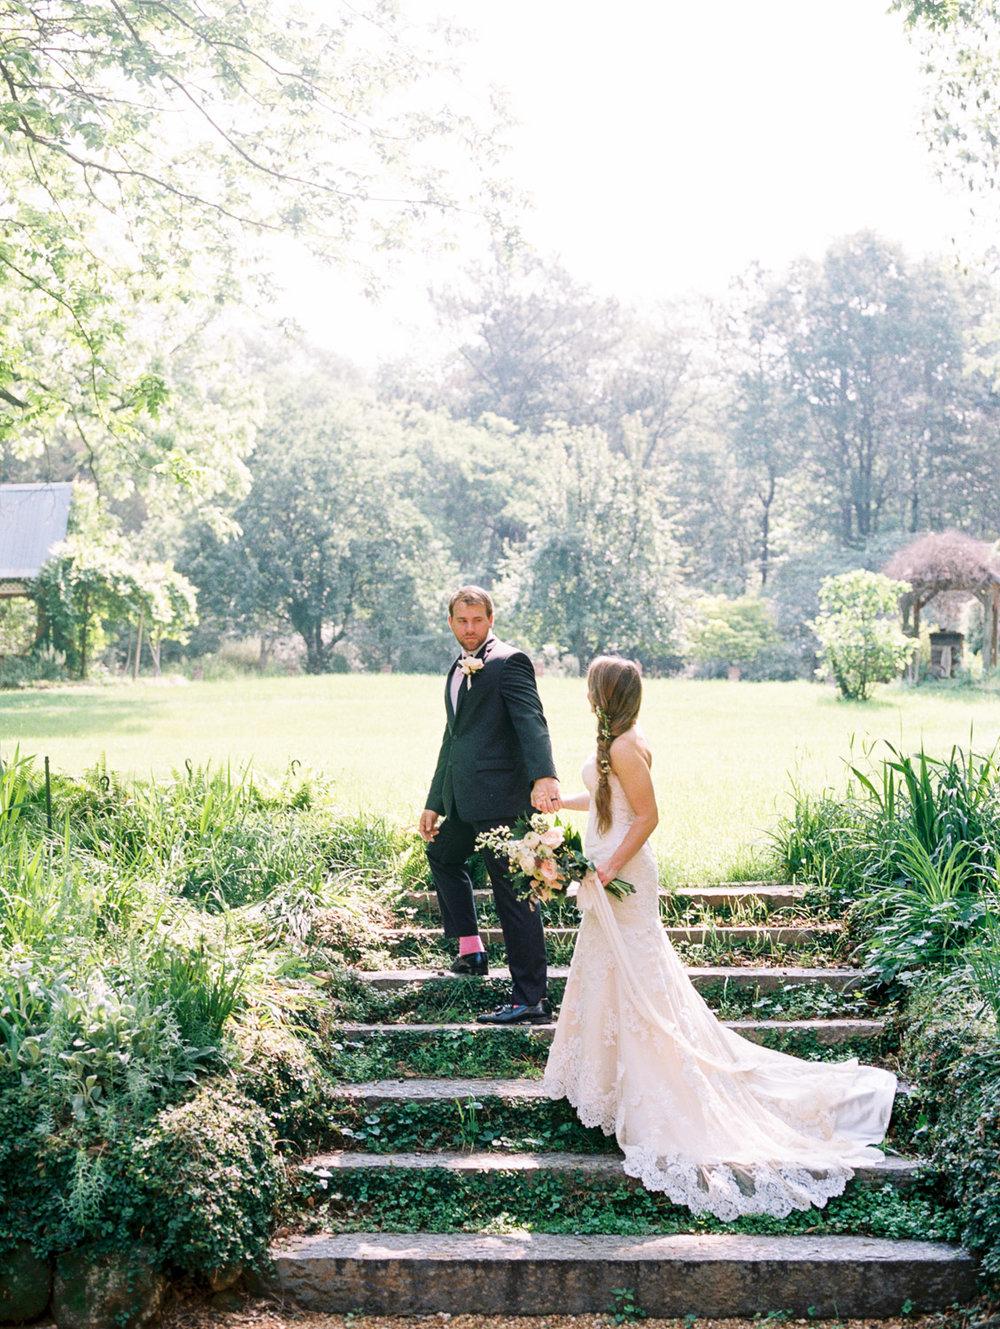 christinadavisphotography-romanticwedding-gardenweddinginspiration09.jpg